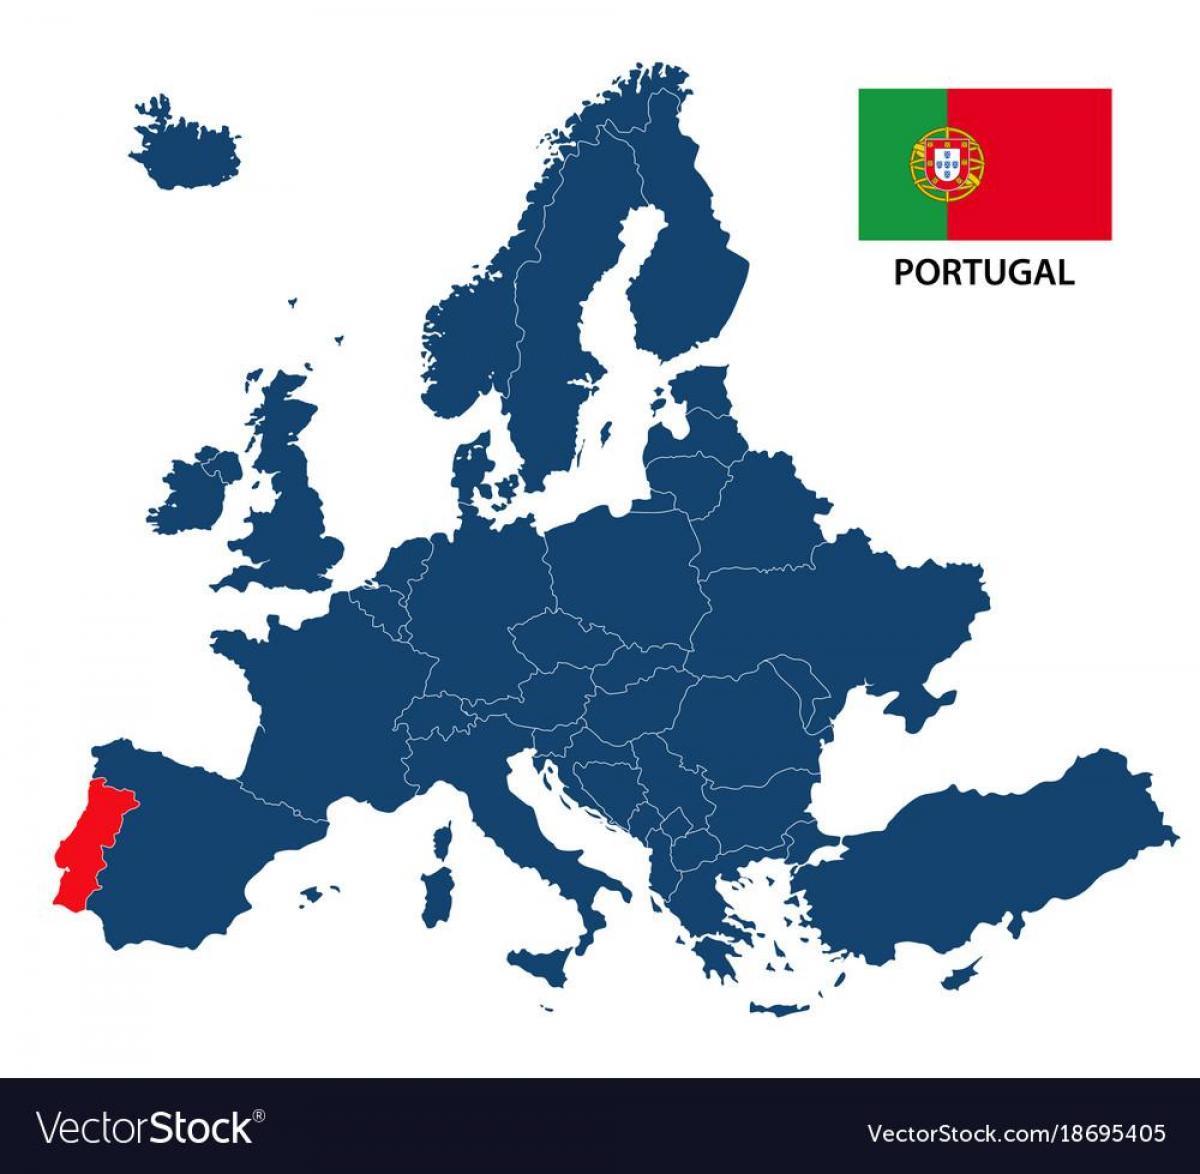 europa kart norsk Europa kart Portugal   Kart over Portugal i Europa (Sør Europa  europa kart norsk